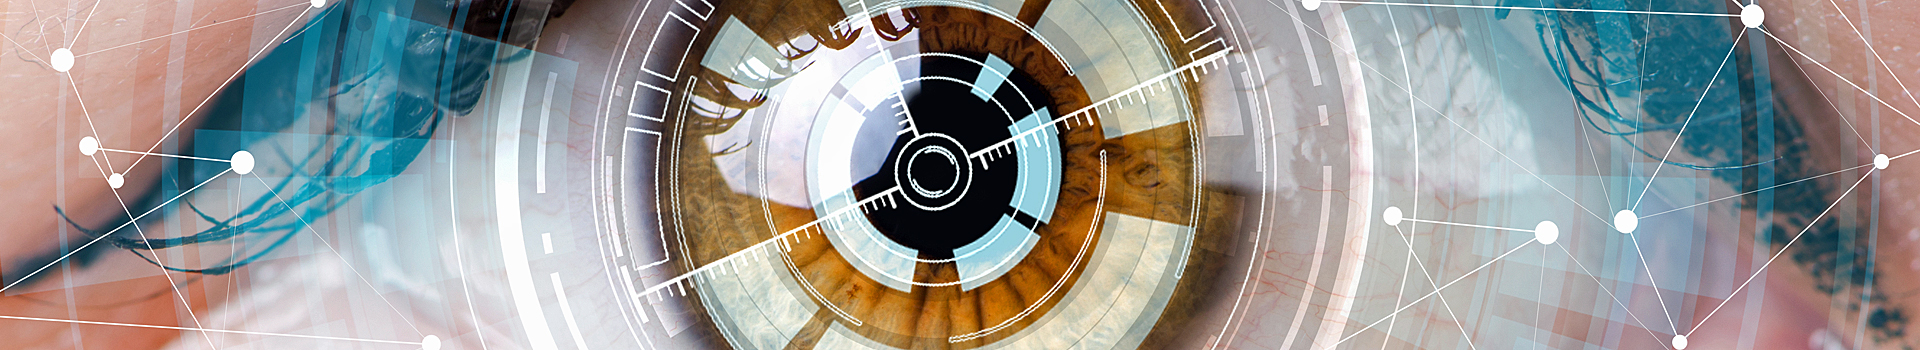 header-eye-academy-03.jpg